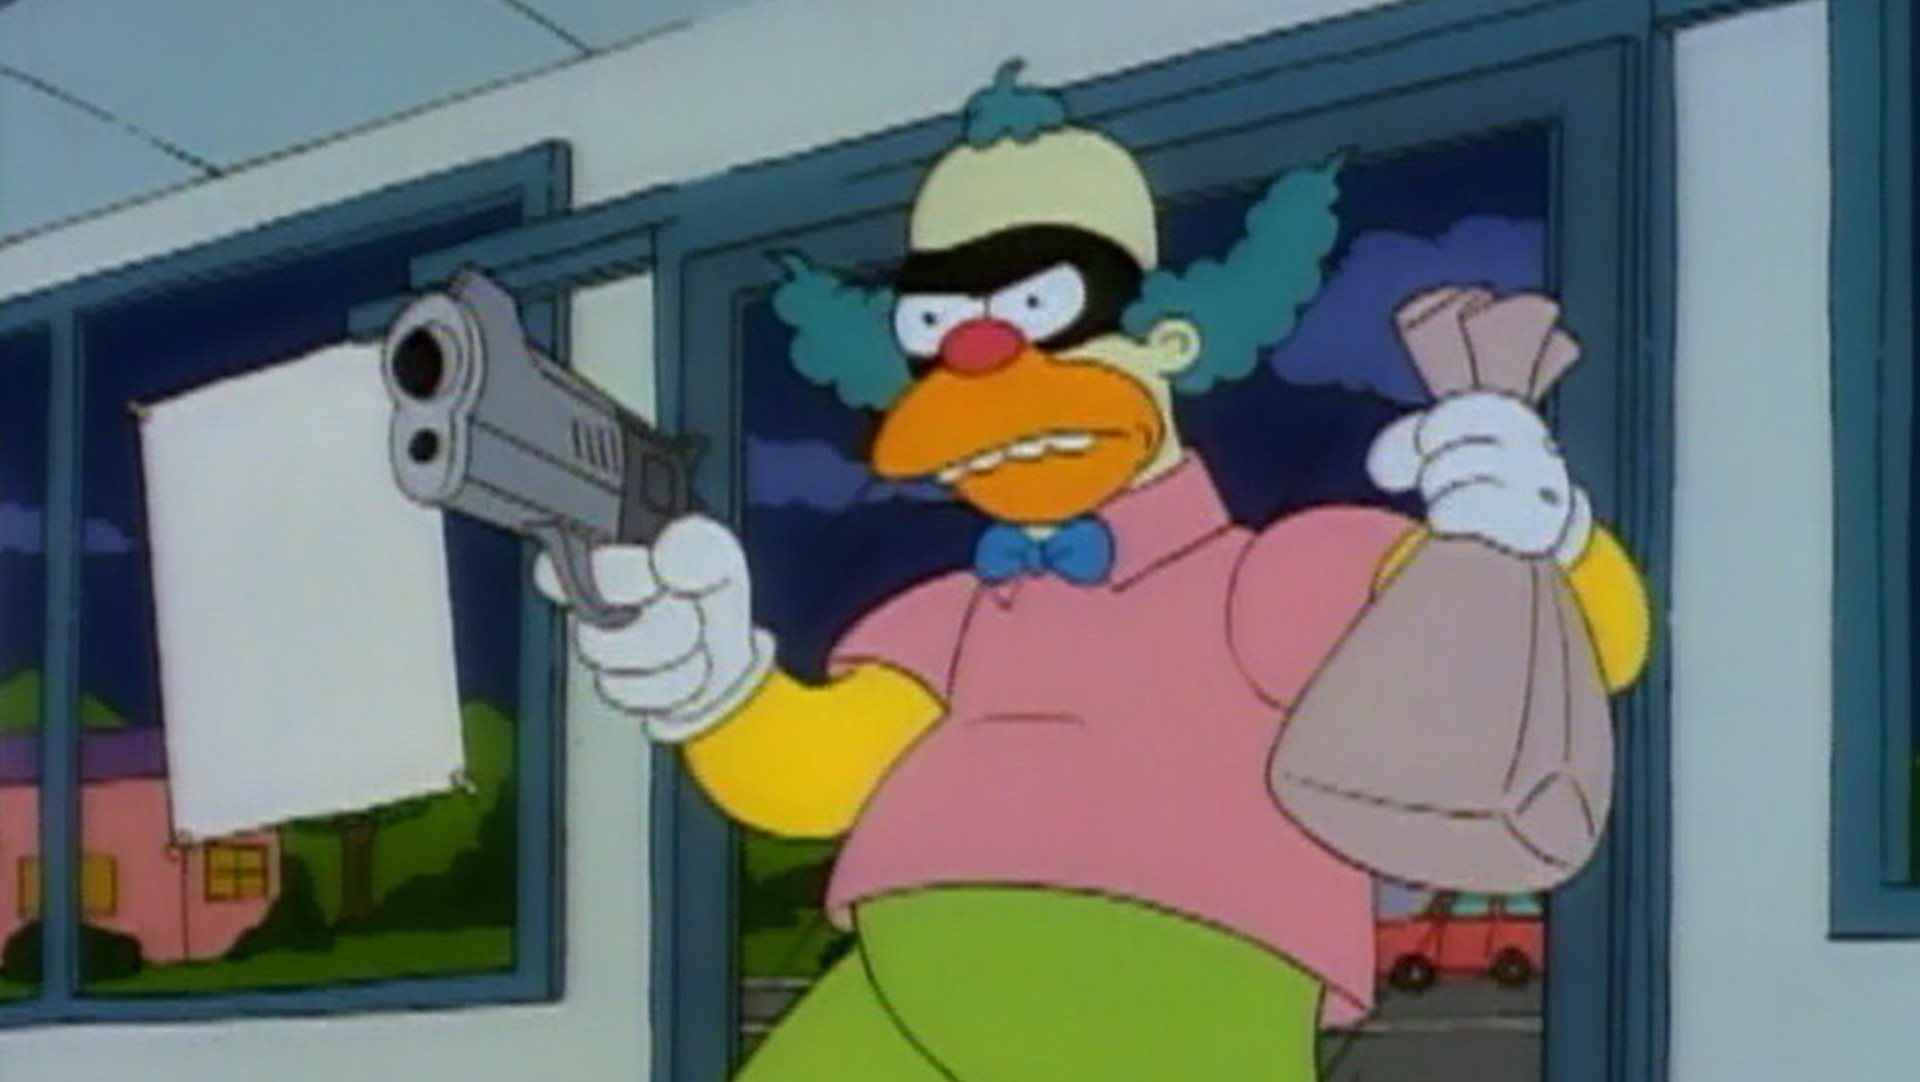 Krusty thief